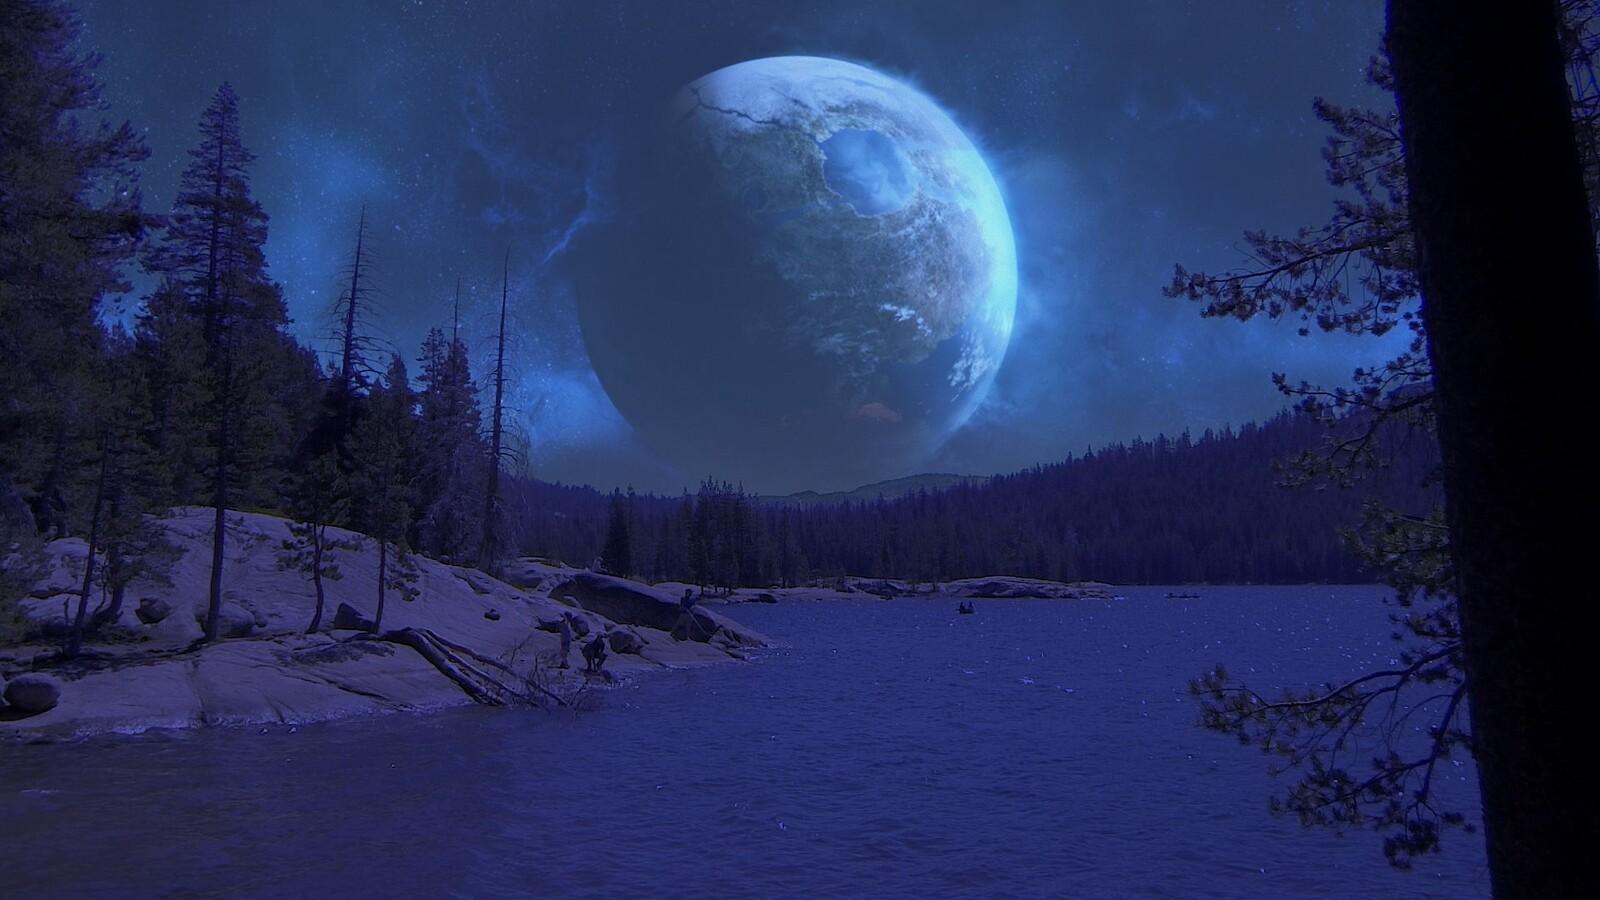 Made by Joseph Forthun using VFX in Blender